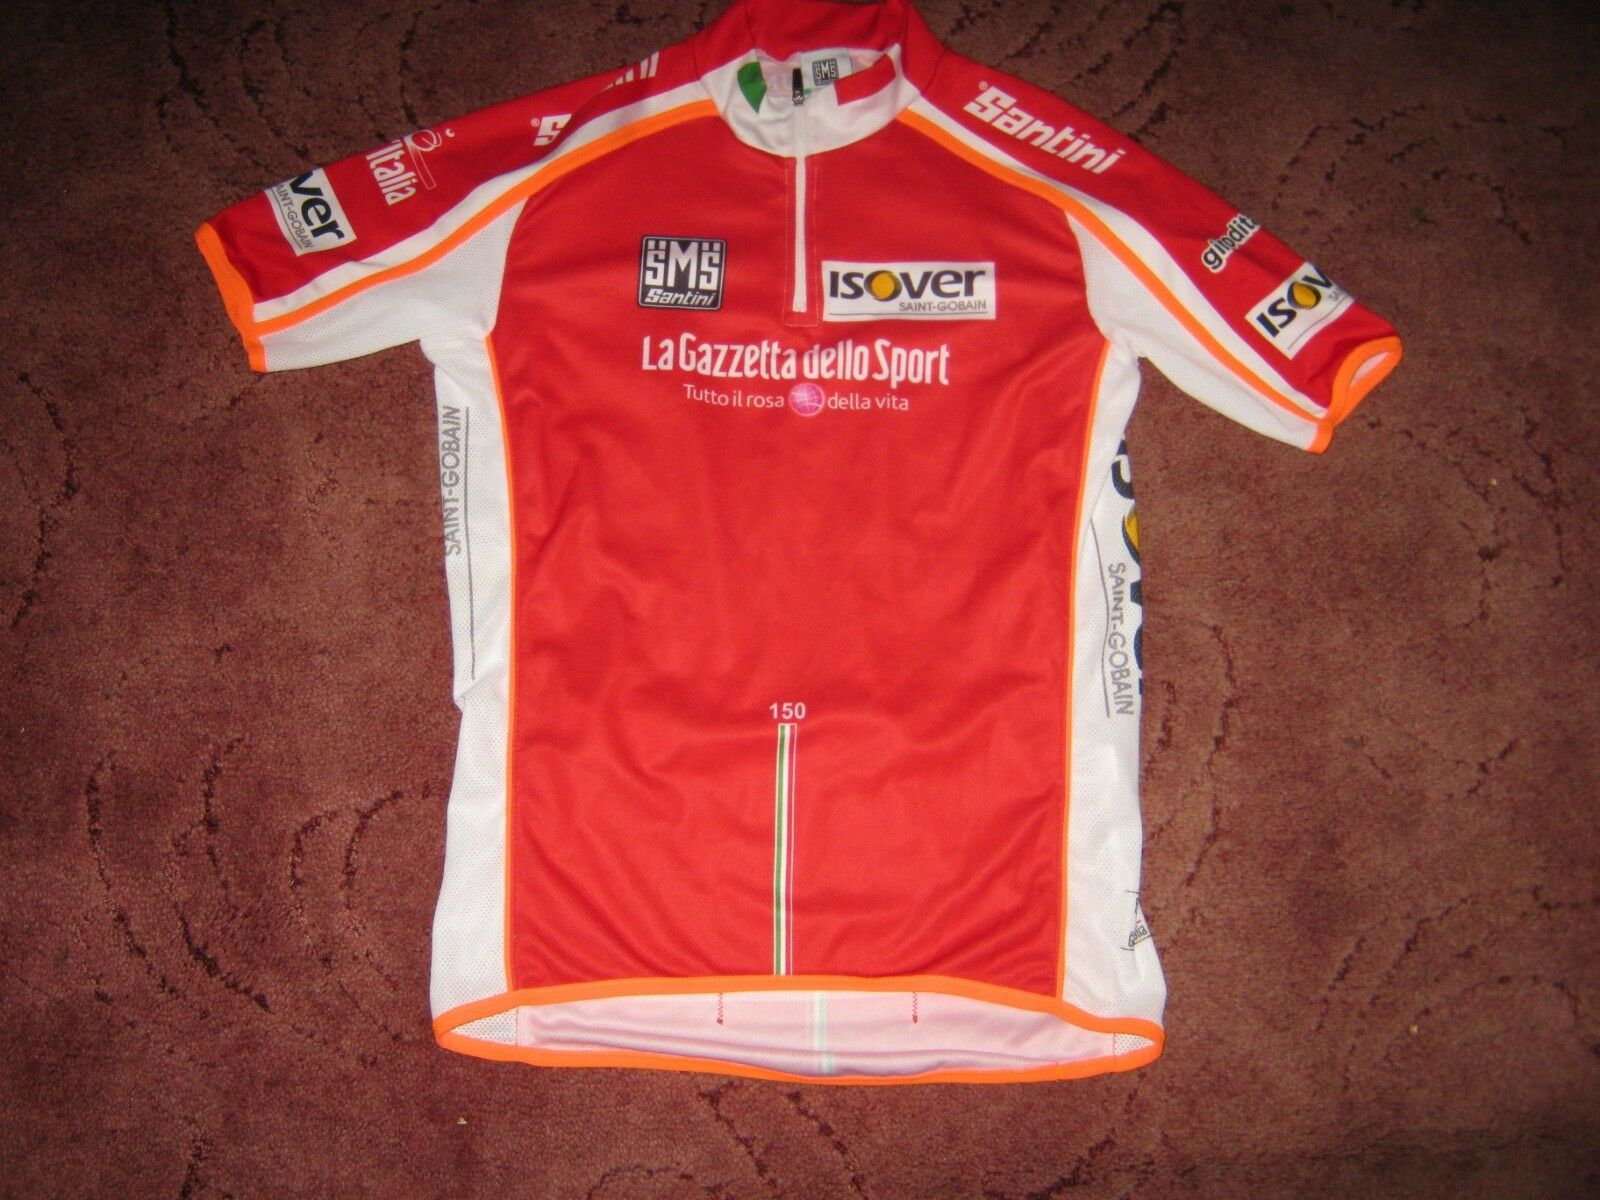 Giro Giro Giro d'Italia tour d'Italie SANTINI rouge points HUNTER Cyclisme Jersey [Medium] f545b6